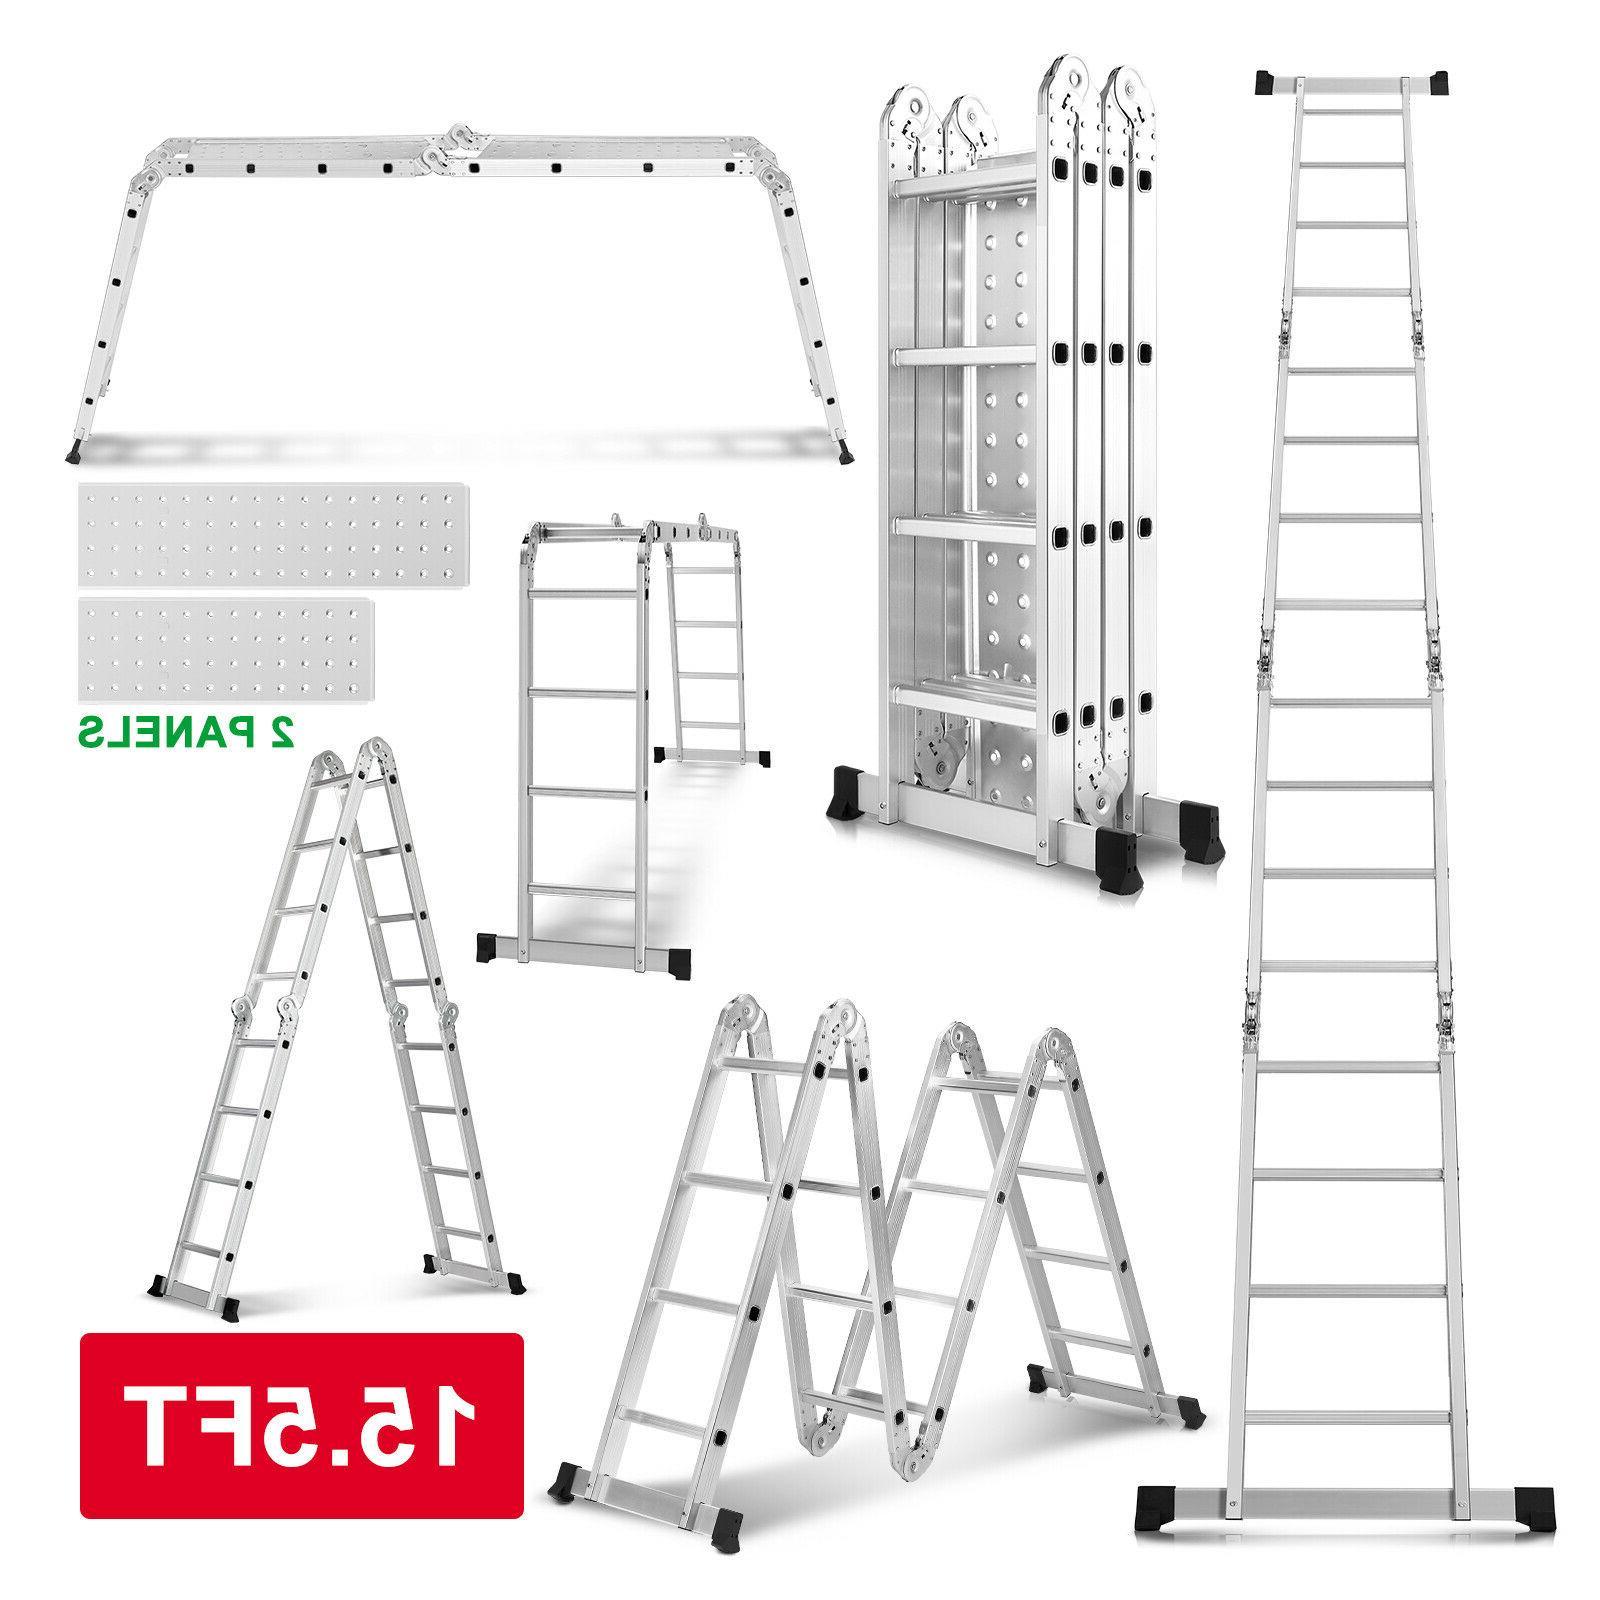 New 15.5/19.5FT Step Ladder Heavy Duty